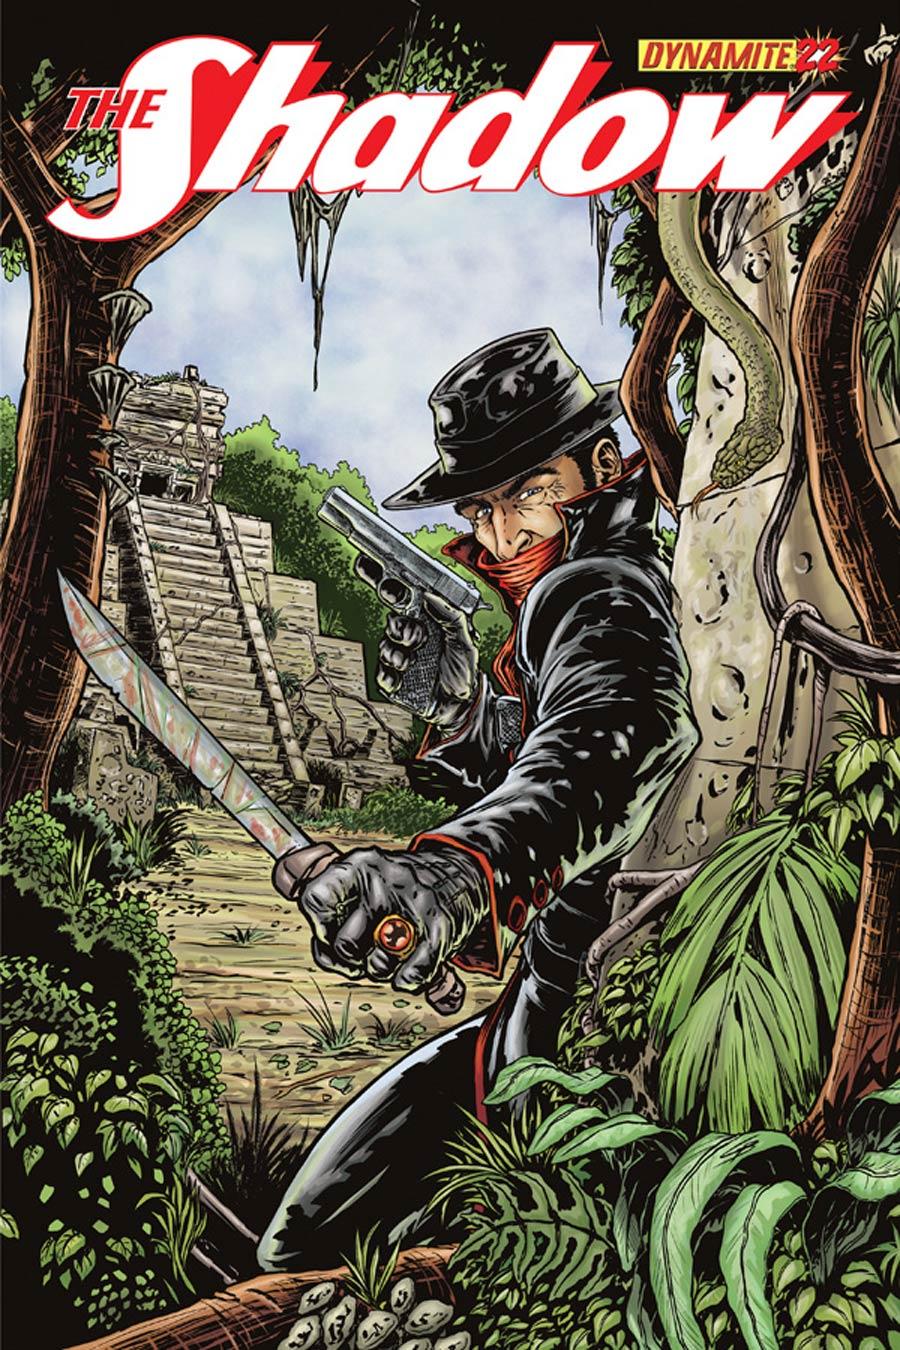 Shadow Vol 5 #22 Cover B Variant Cris Bolson Cover